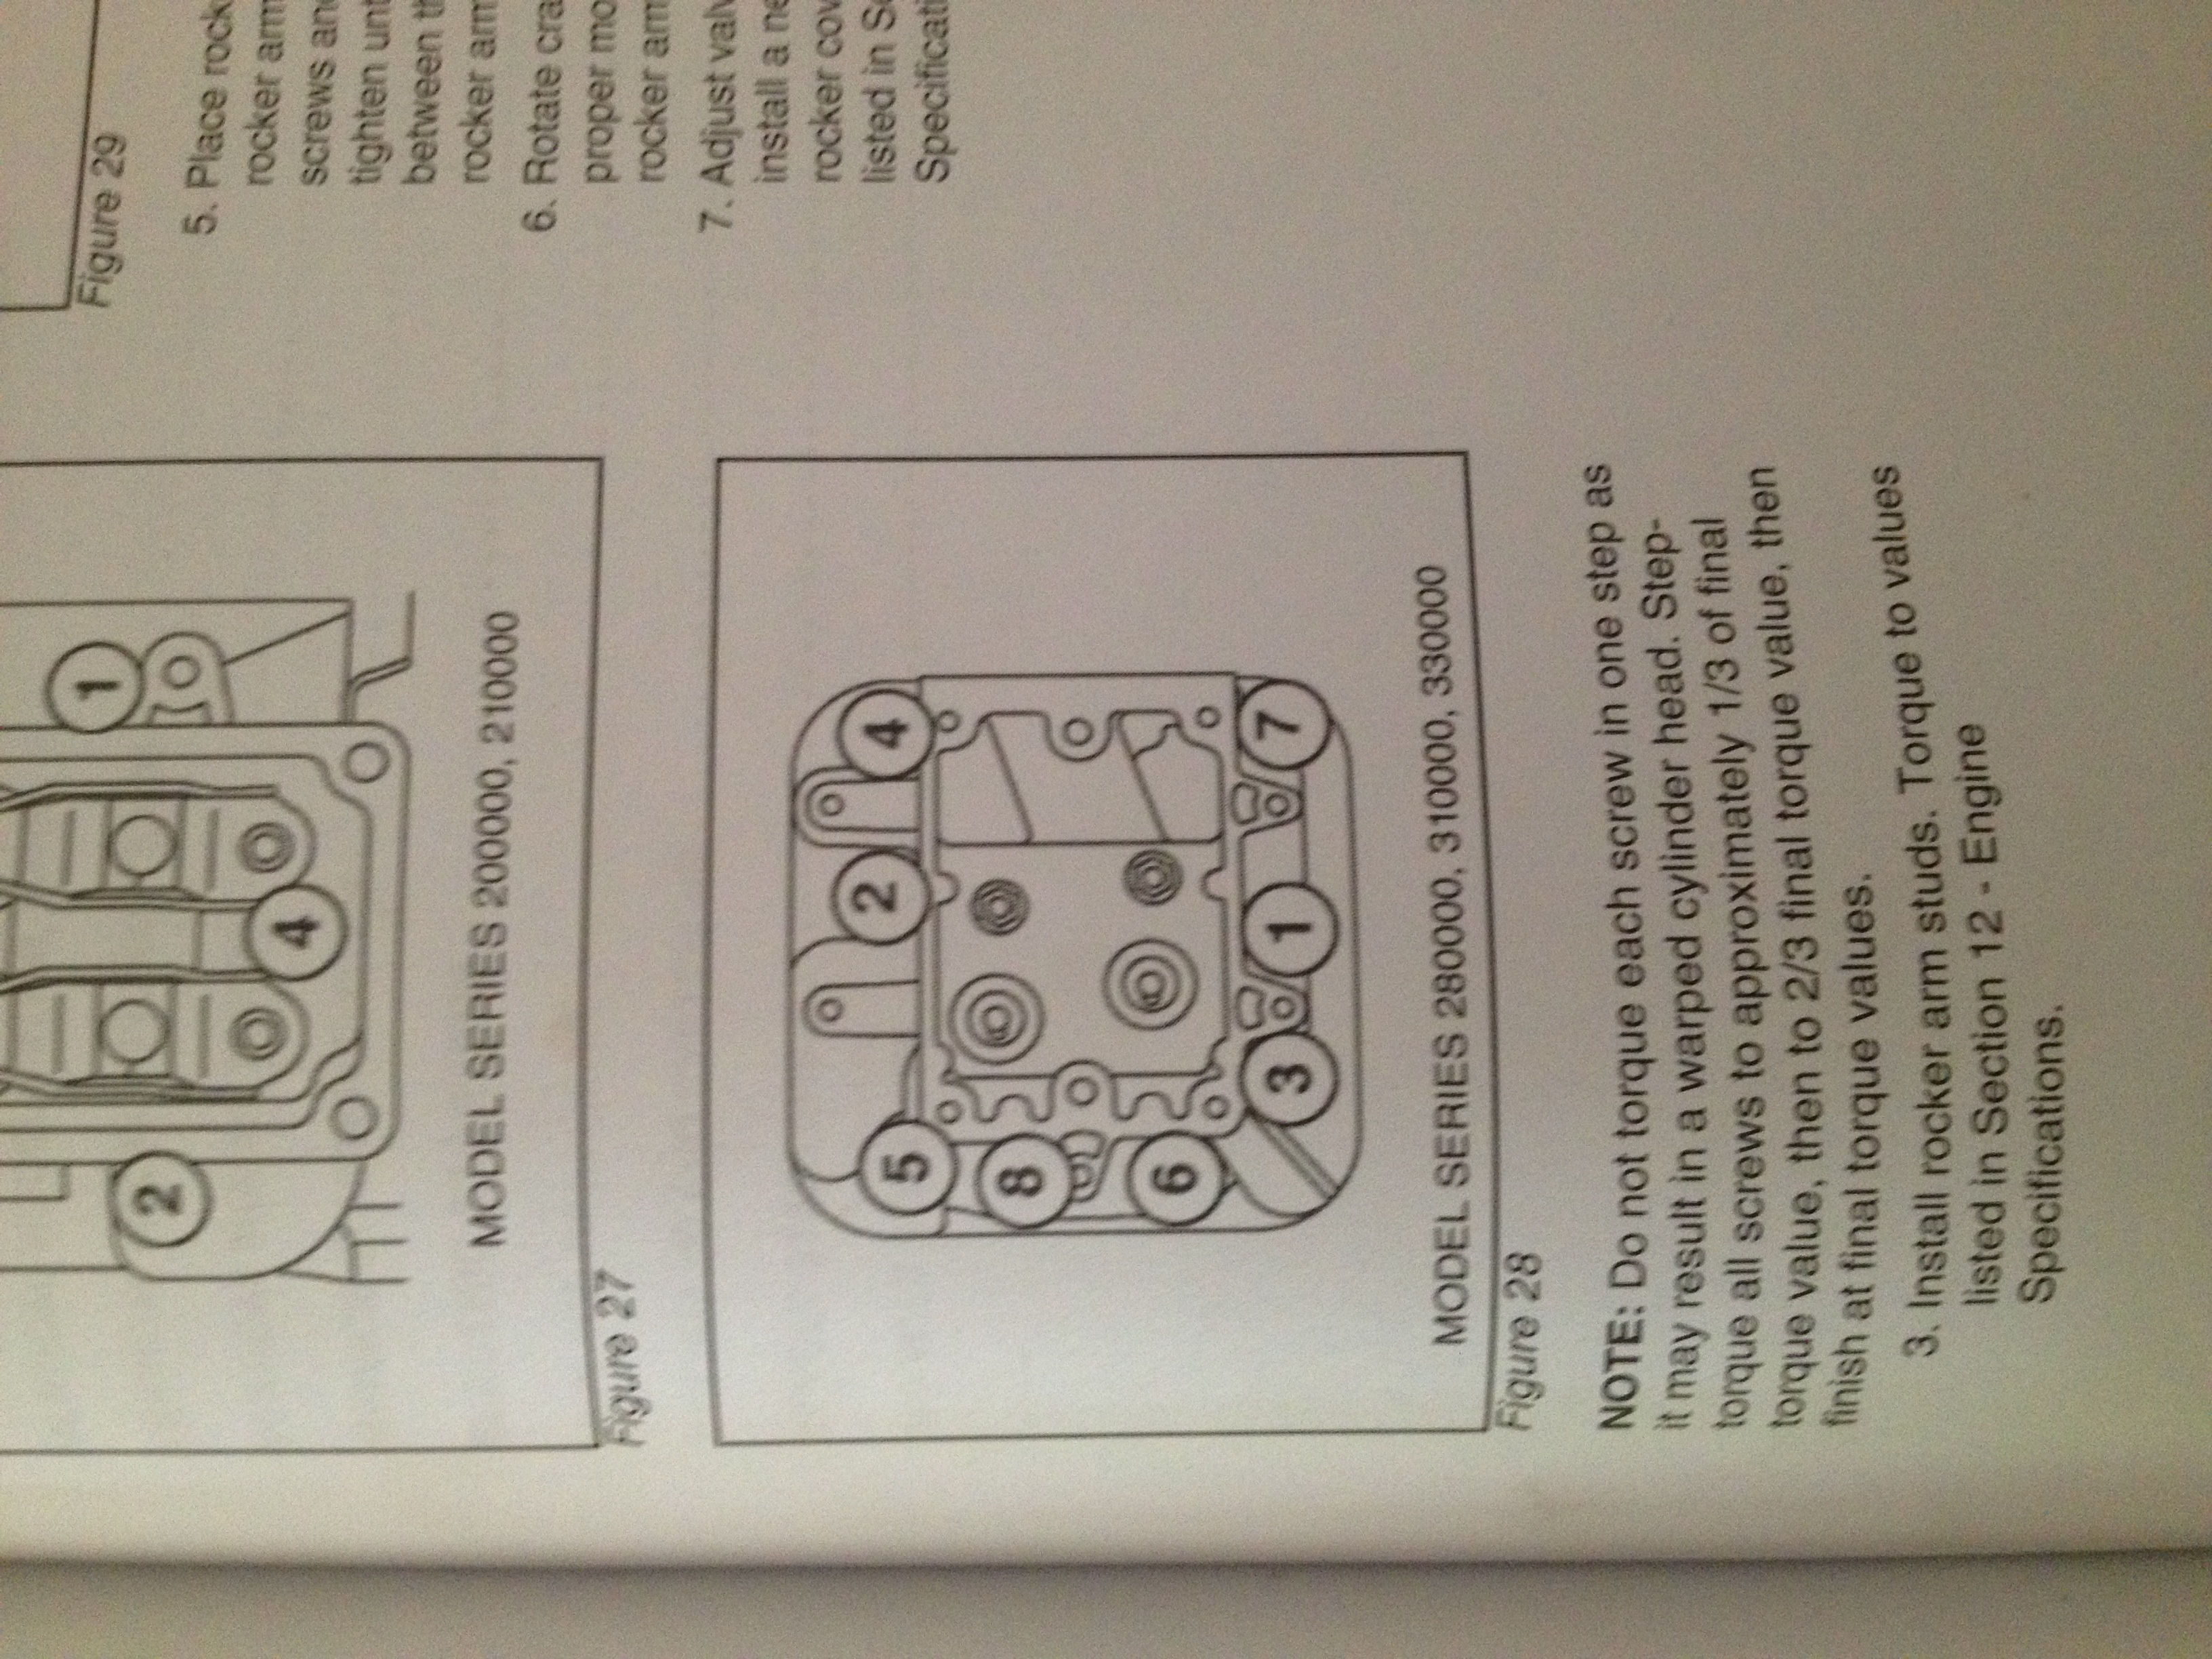 I Have A Bs Engine Model 21b907 Type 0137 E1 Trim 04084 Za Audi Diagram Torque Head Full Size Image